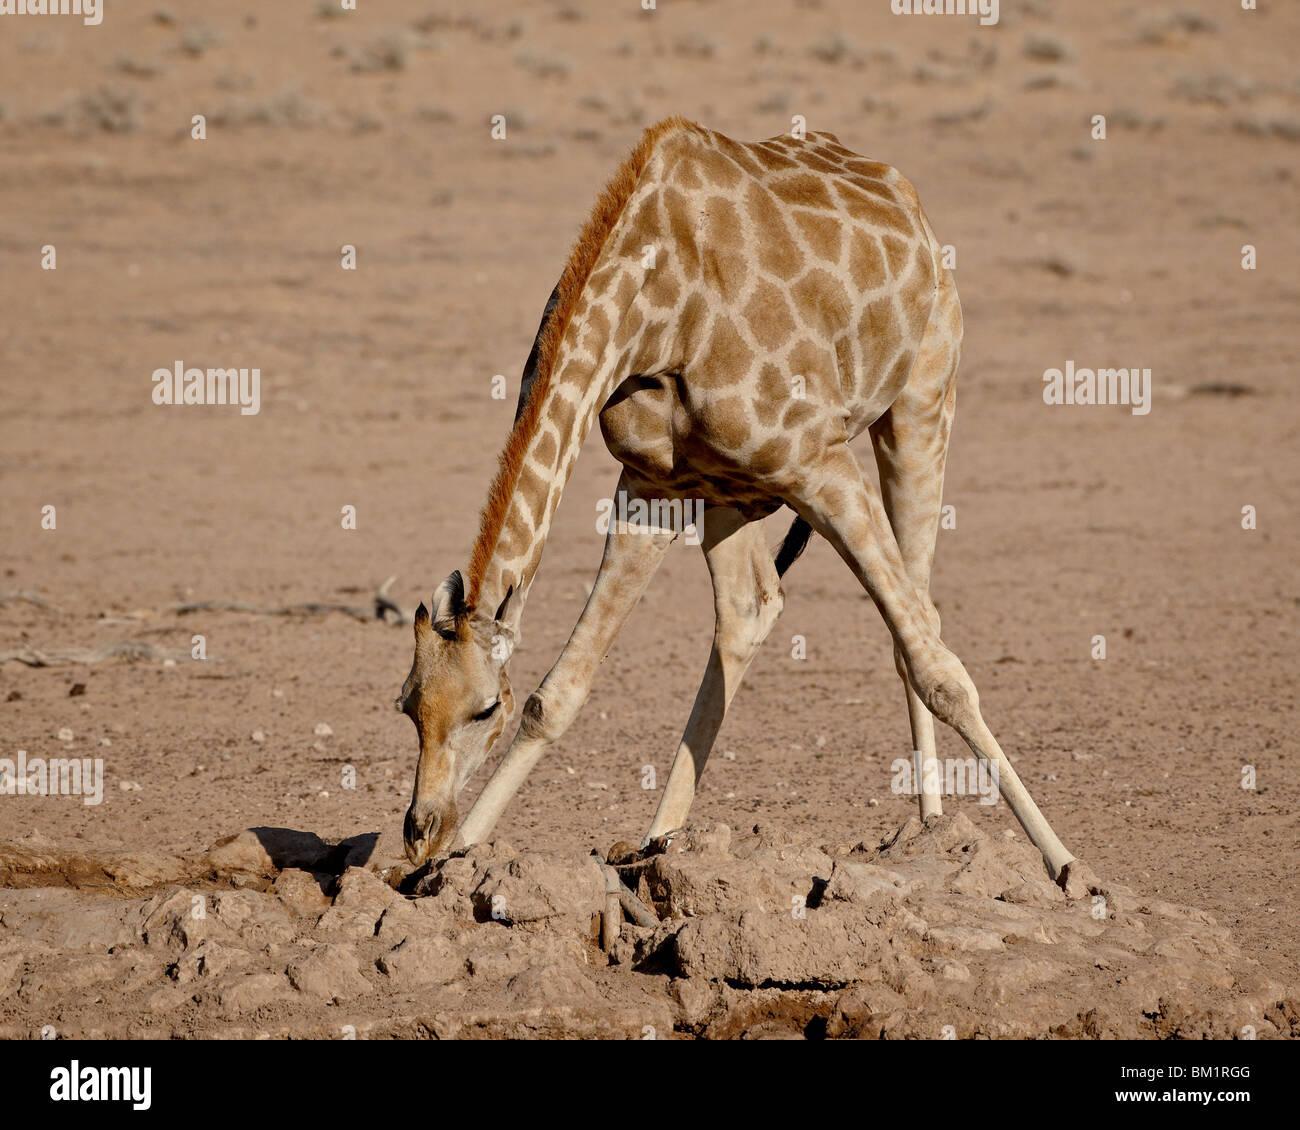 Cape giraffe (Giraffa camelopardalis giraffa) drinking, Kgalagadi Transfrontier Park, South Africa - Stock Image